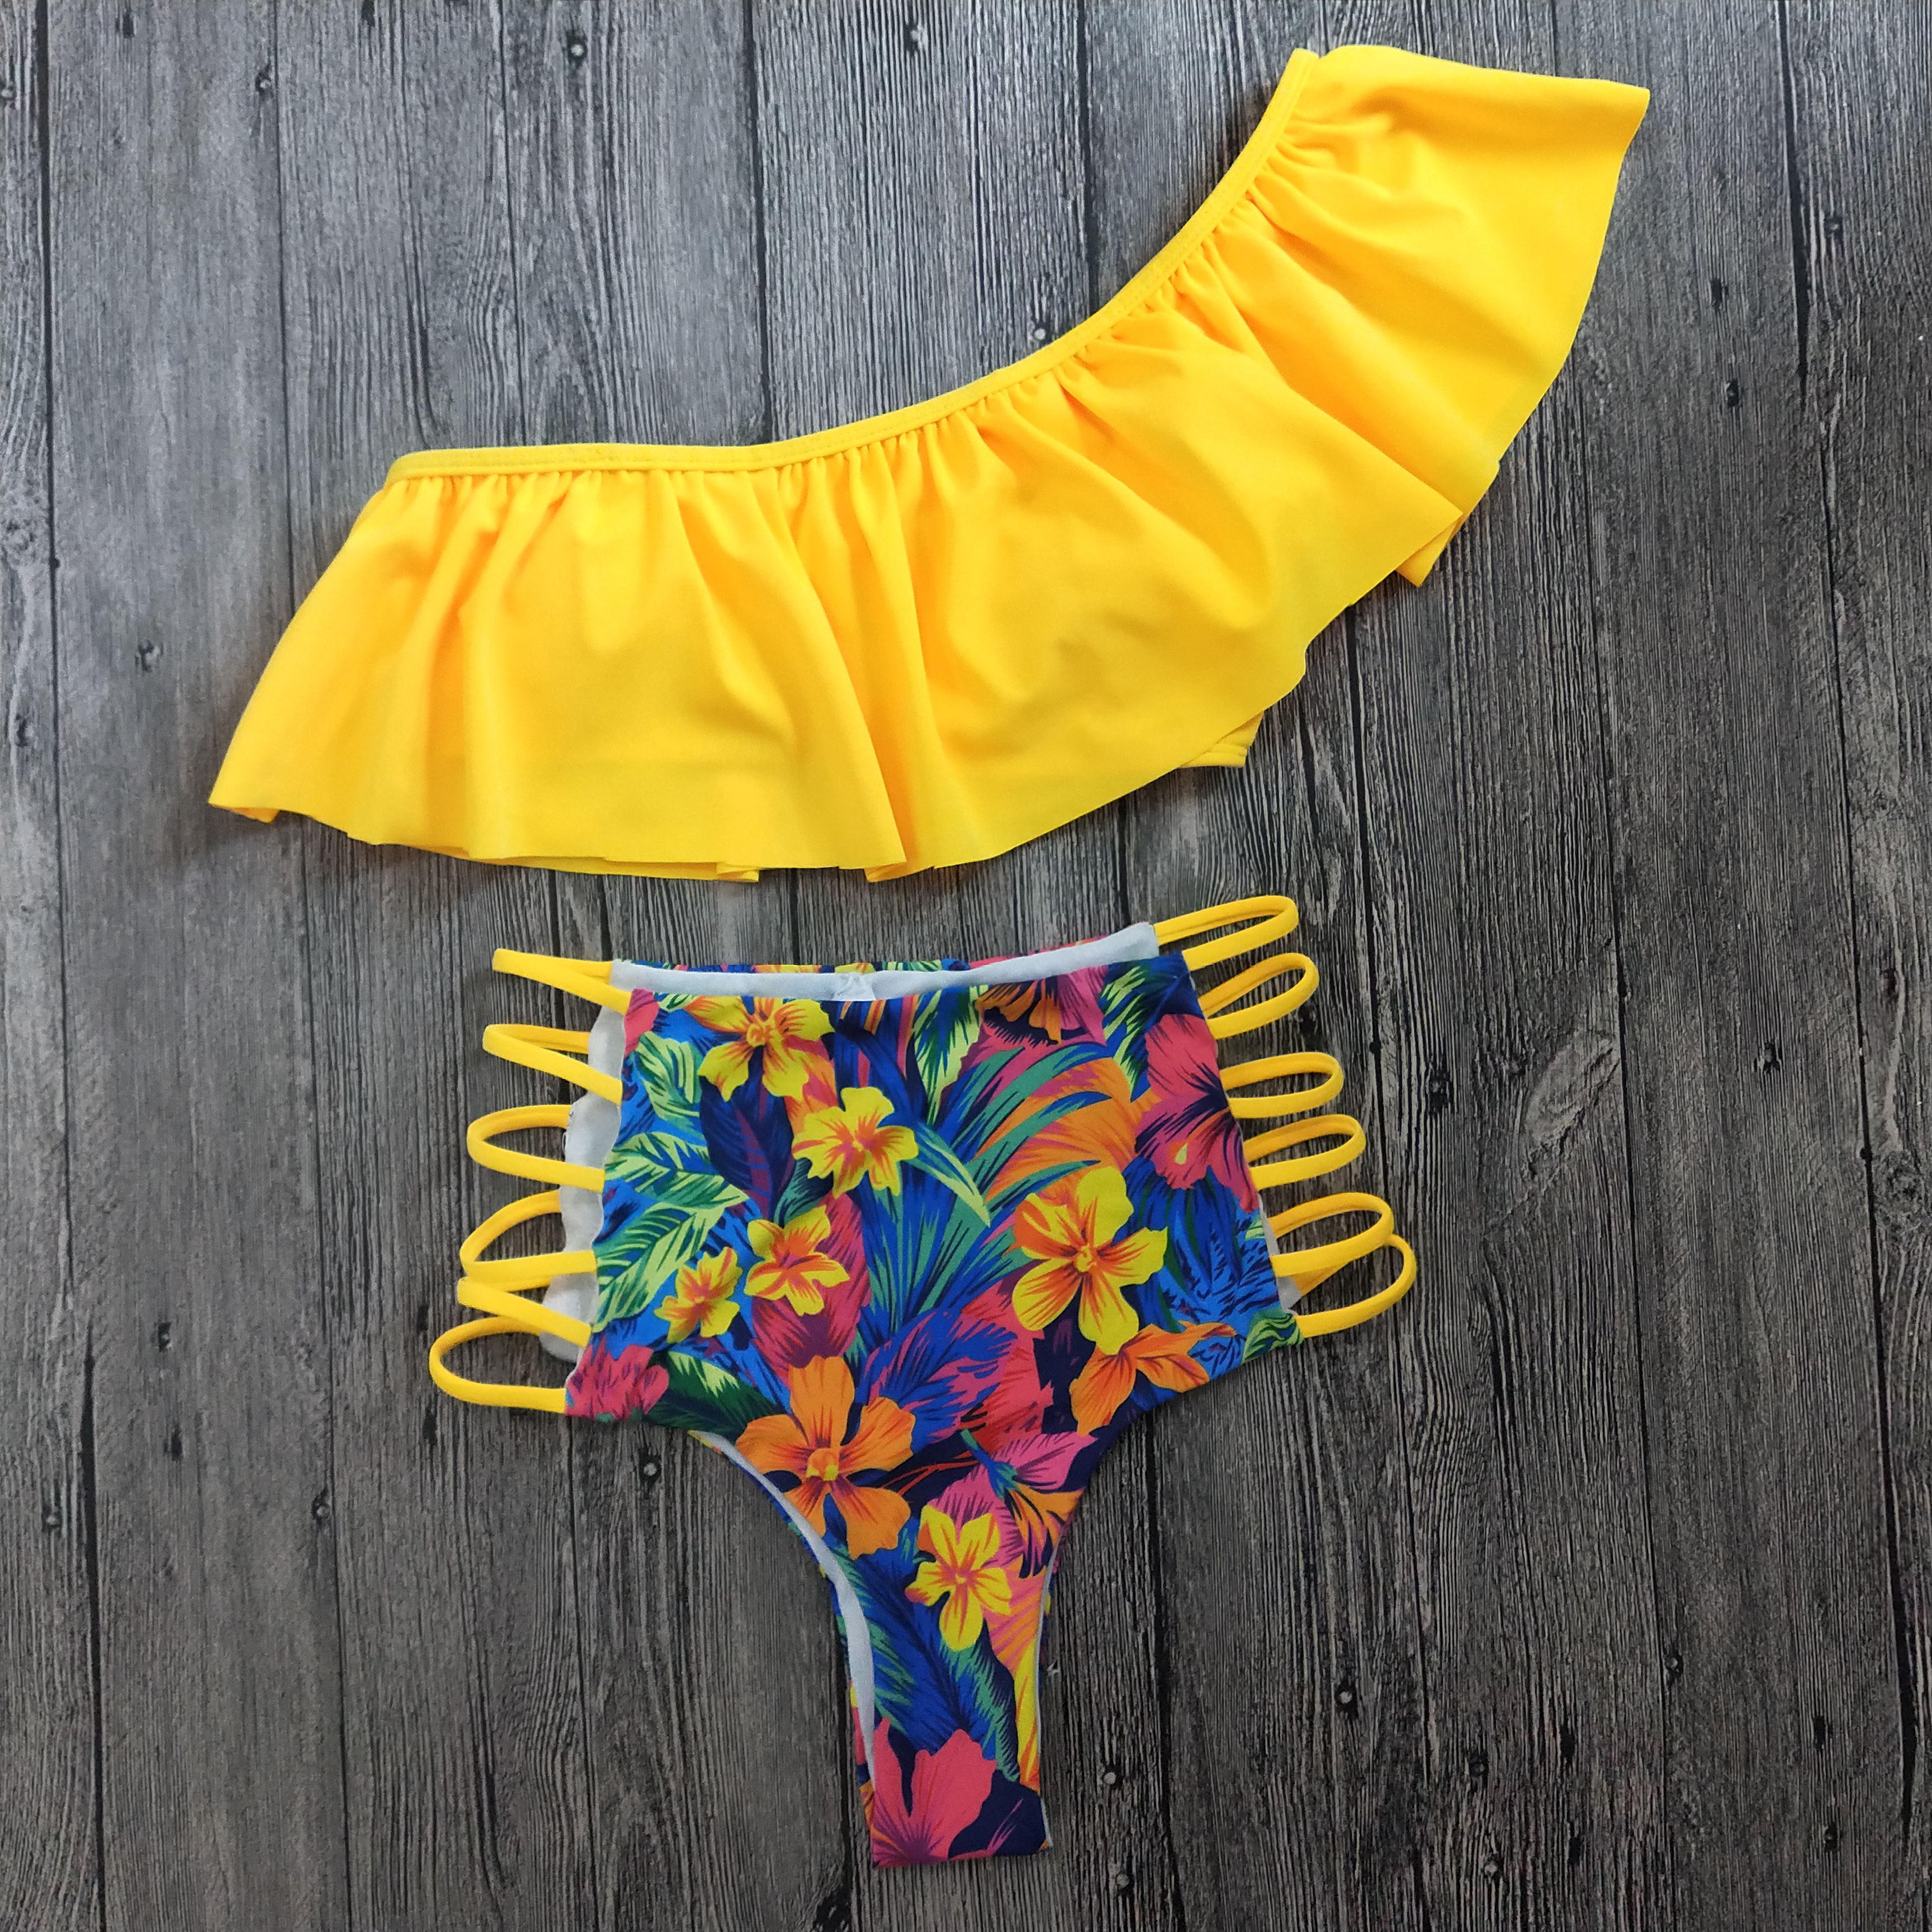 H9f8f7fe627d0463883e91a29a8826c5aF 2019 Sexy Brazilian Bikini Swimwear Women Halter Push Up Bikini Set Swimsuit Female Floral Print Bandage Biquini Bathing Suit